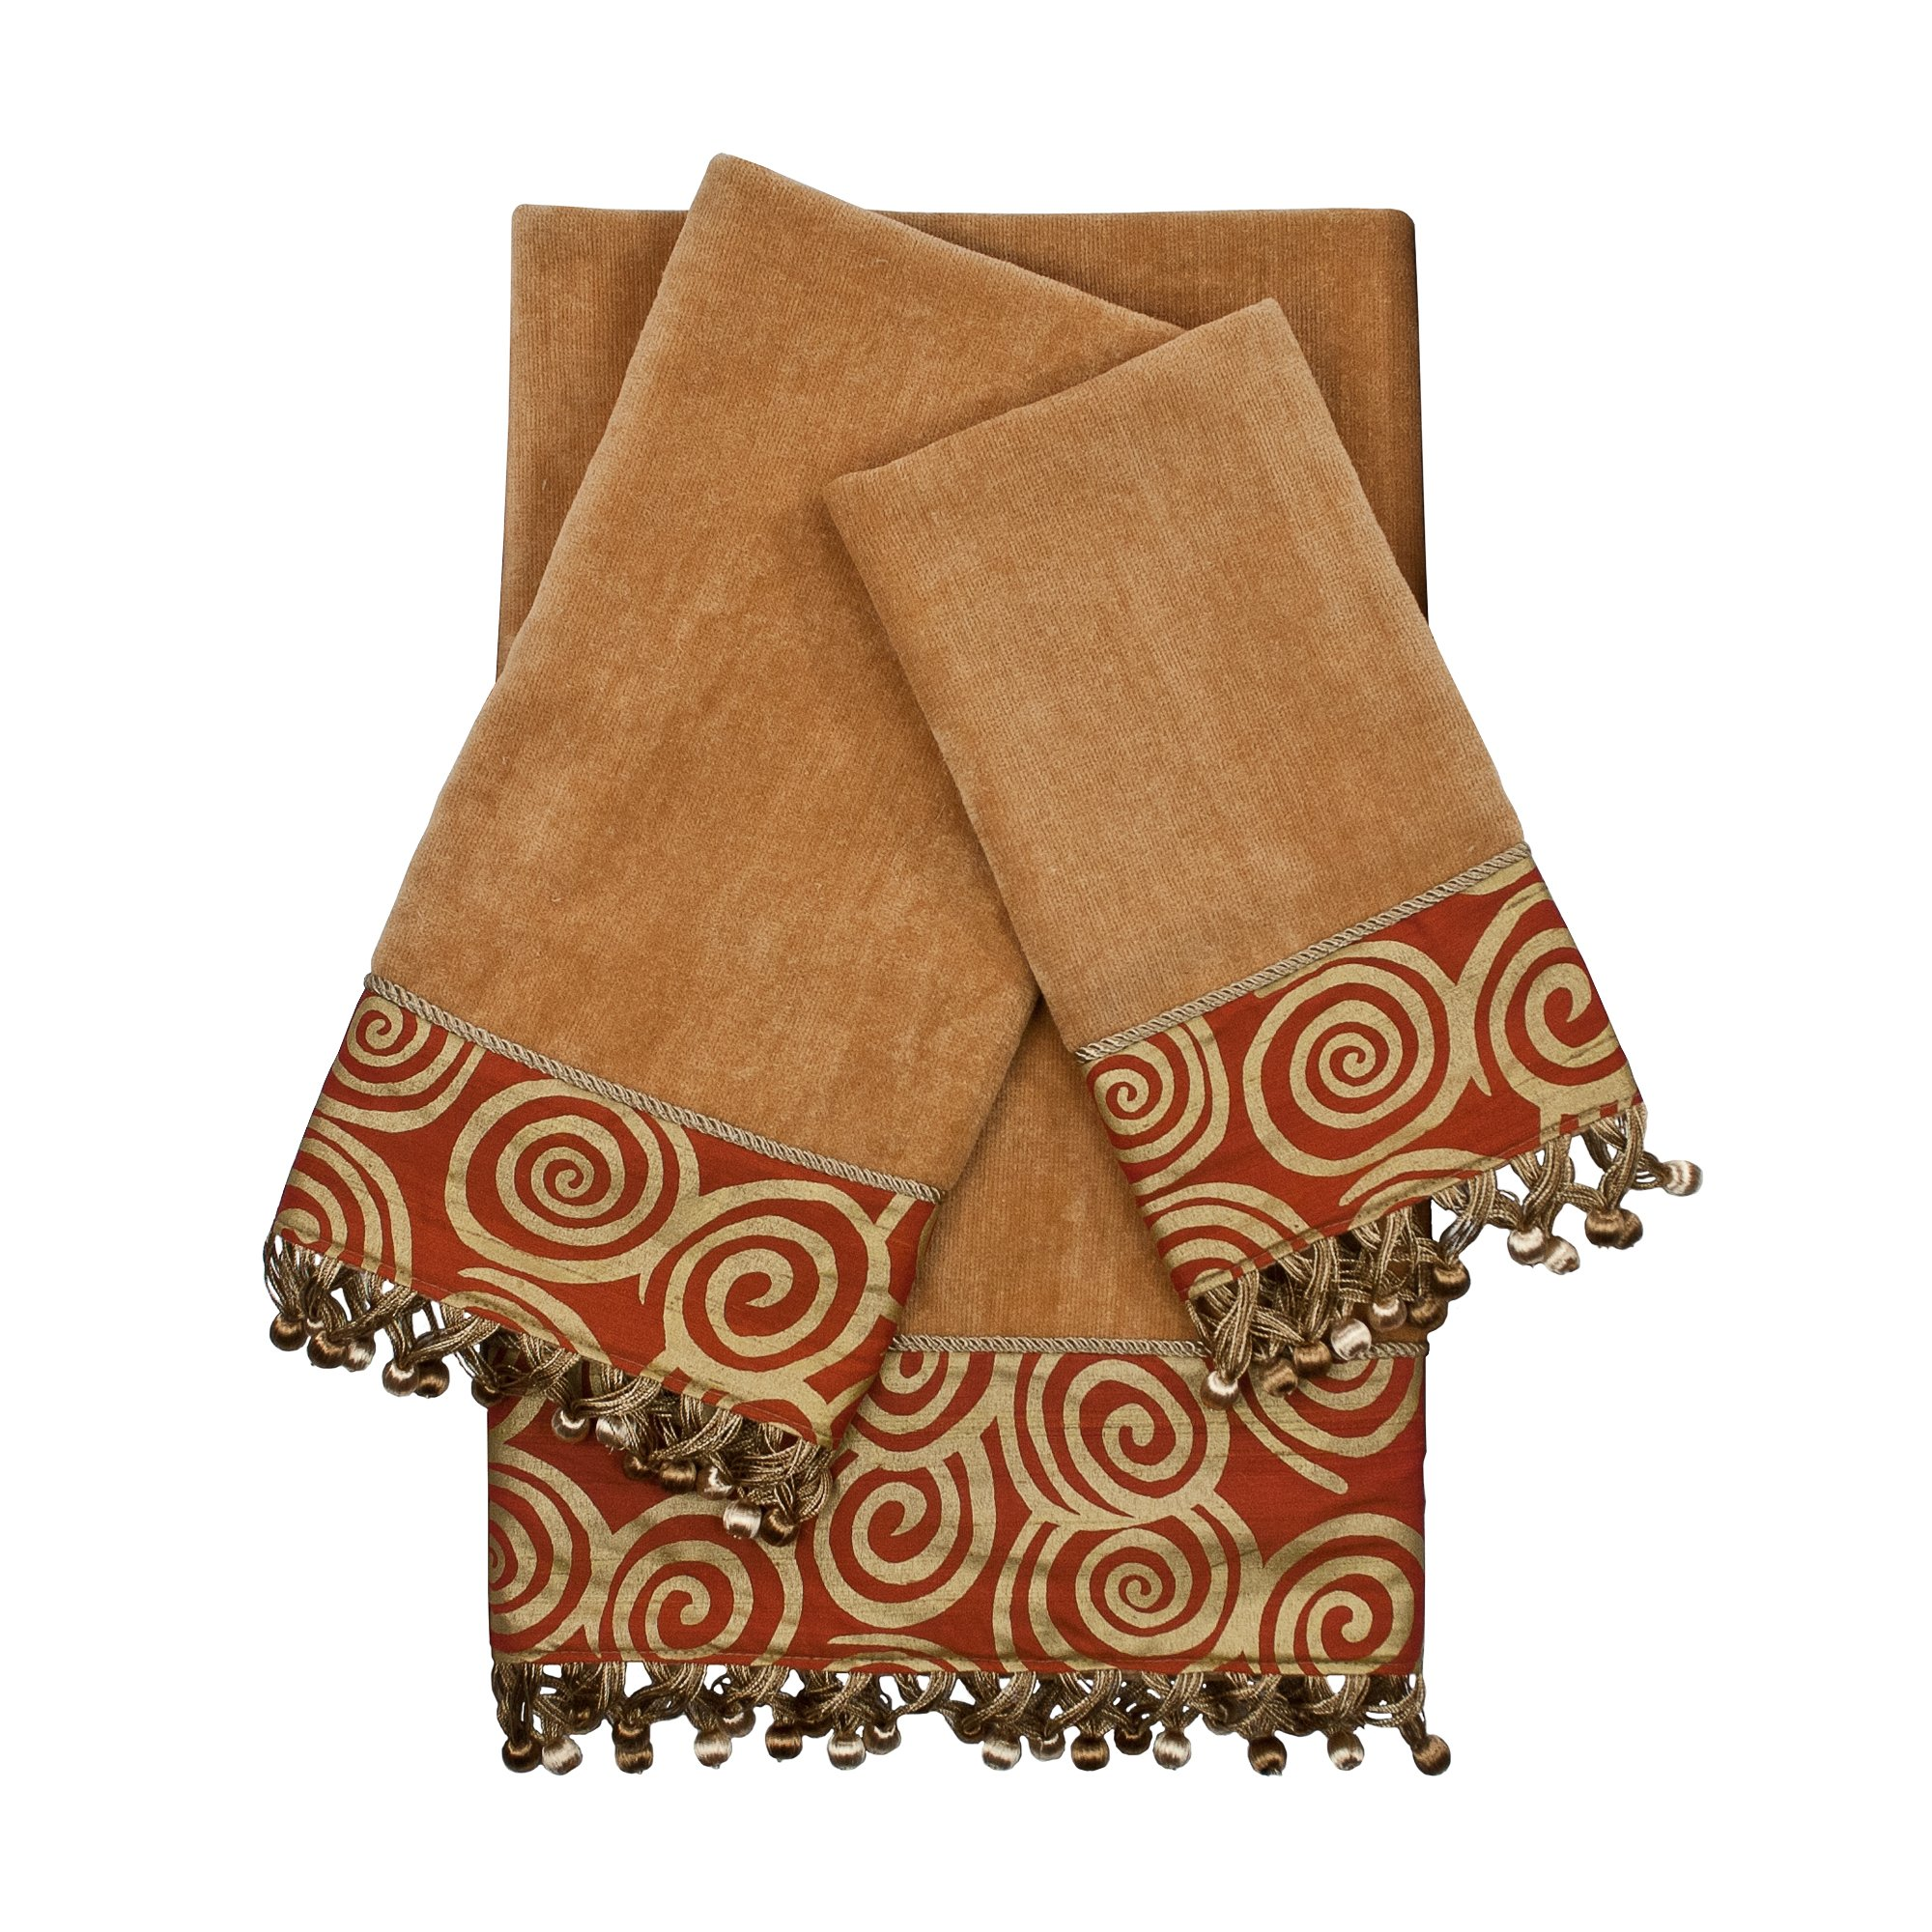 Sherry Kline Swirley Nugget 3Piece Embellished Towel Set Nugget Gold